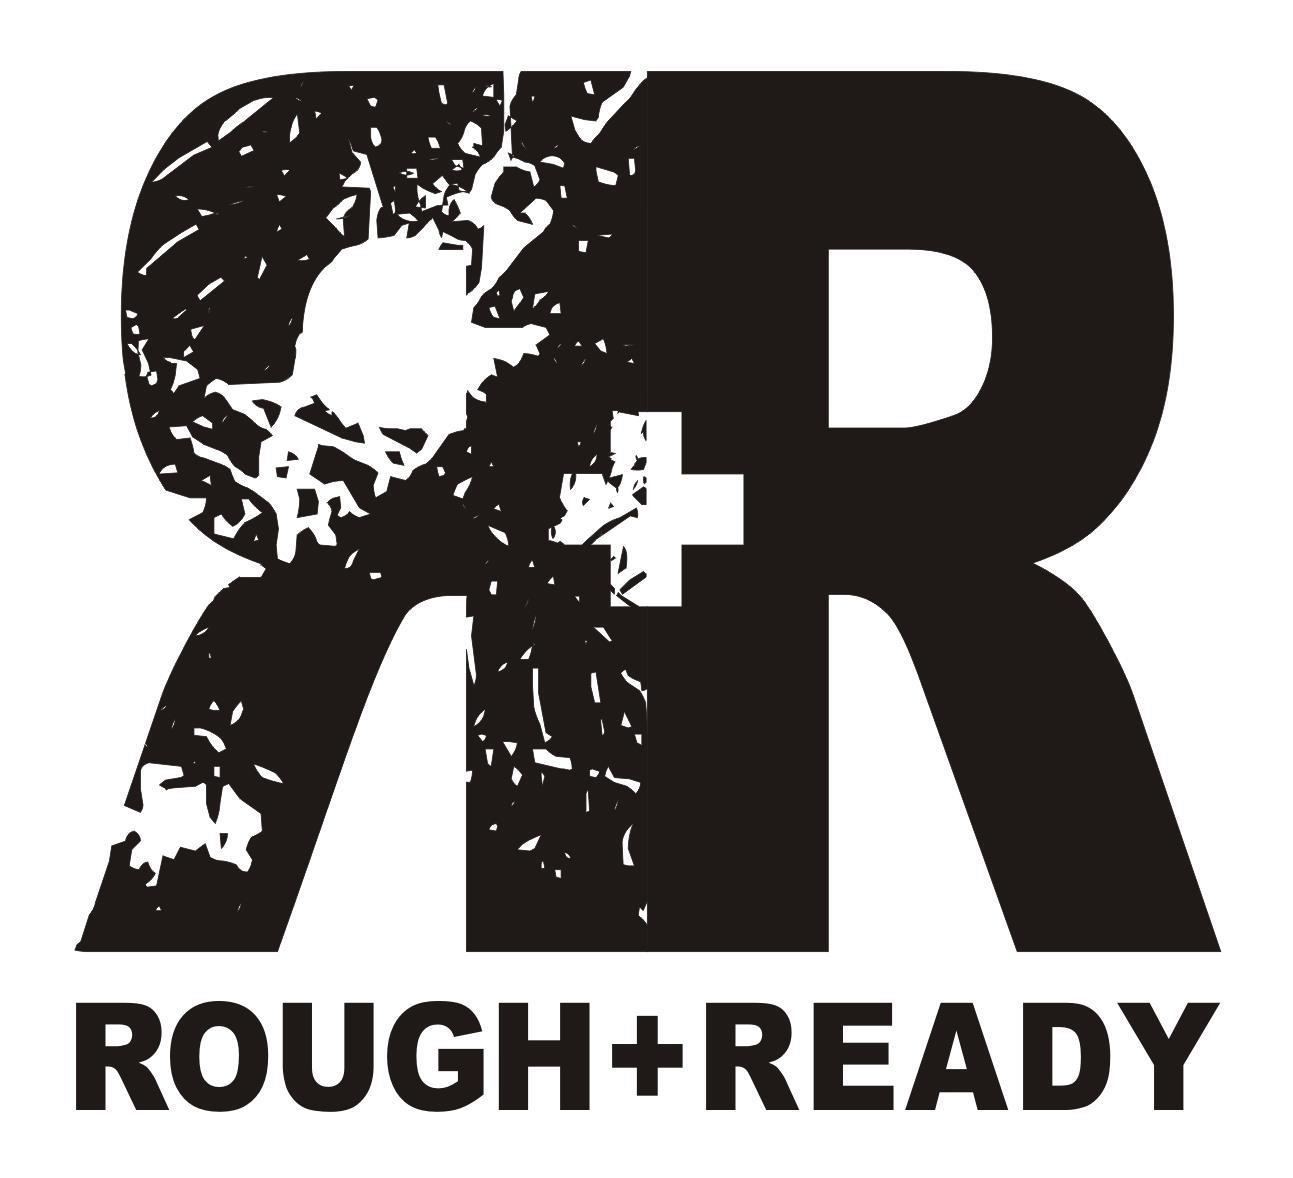 Rough + Ready.jpg